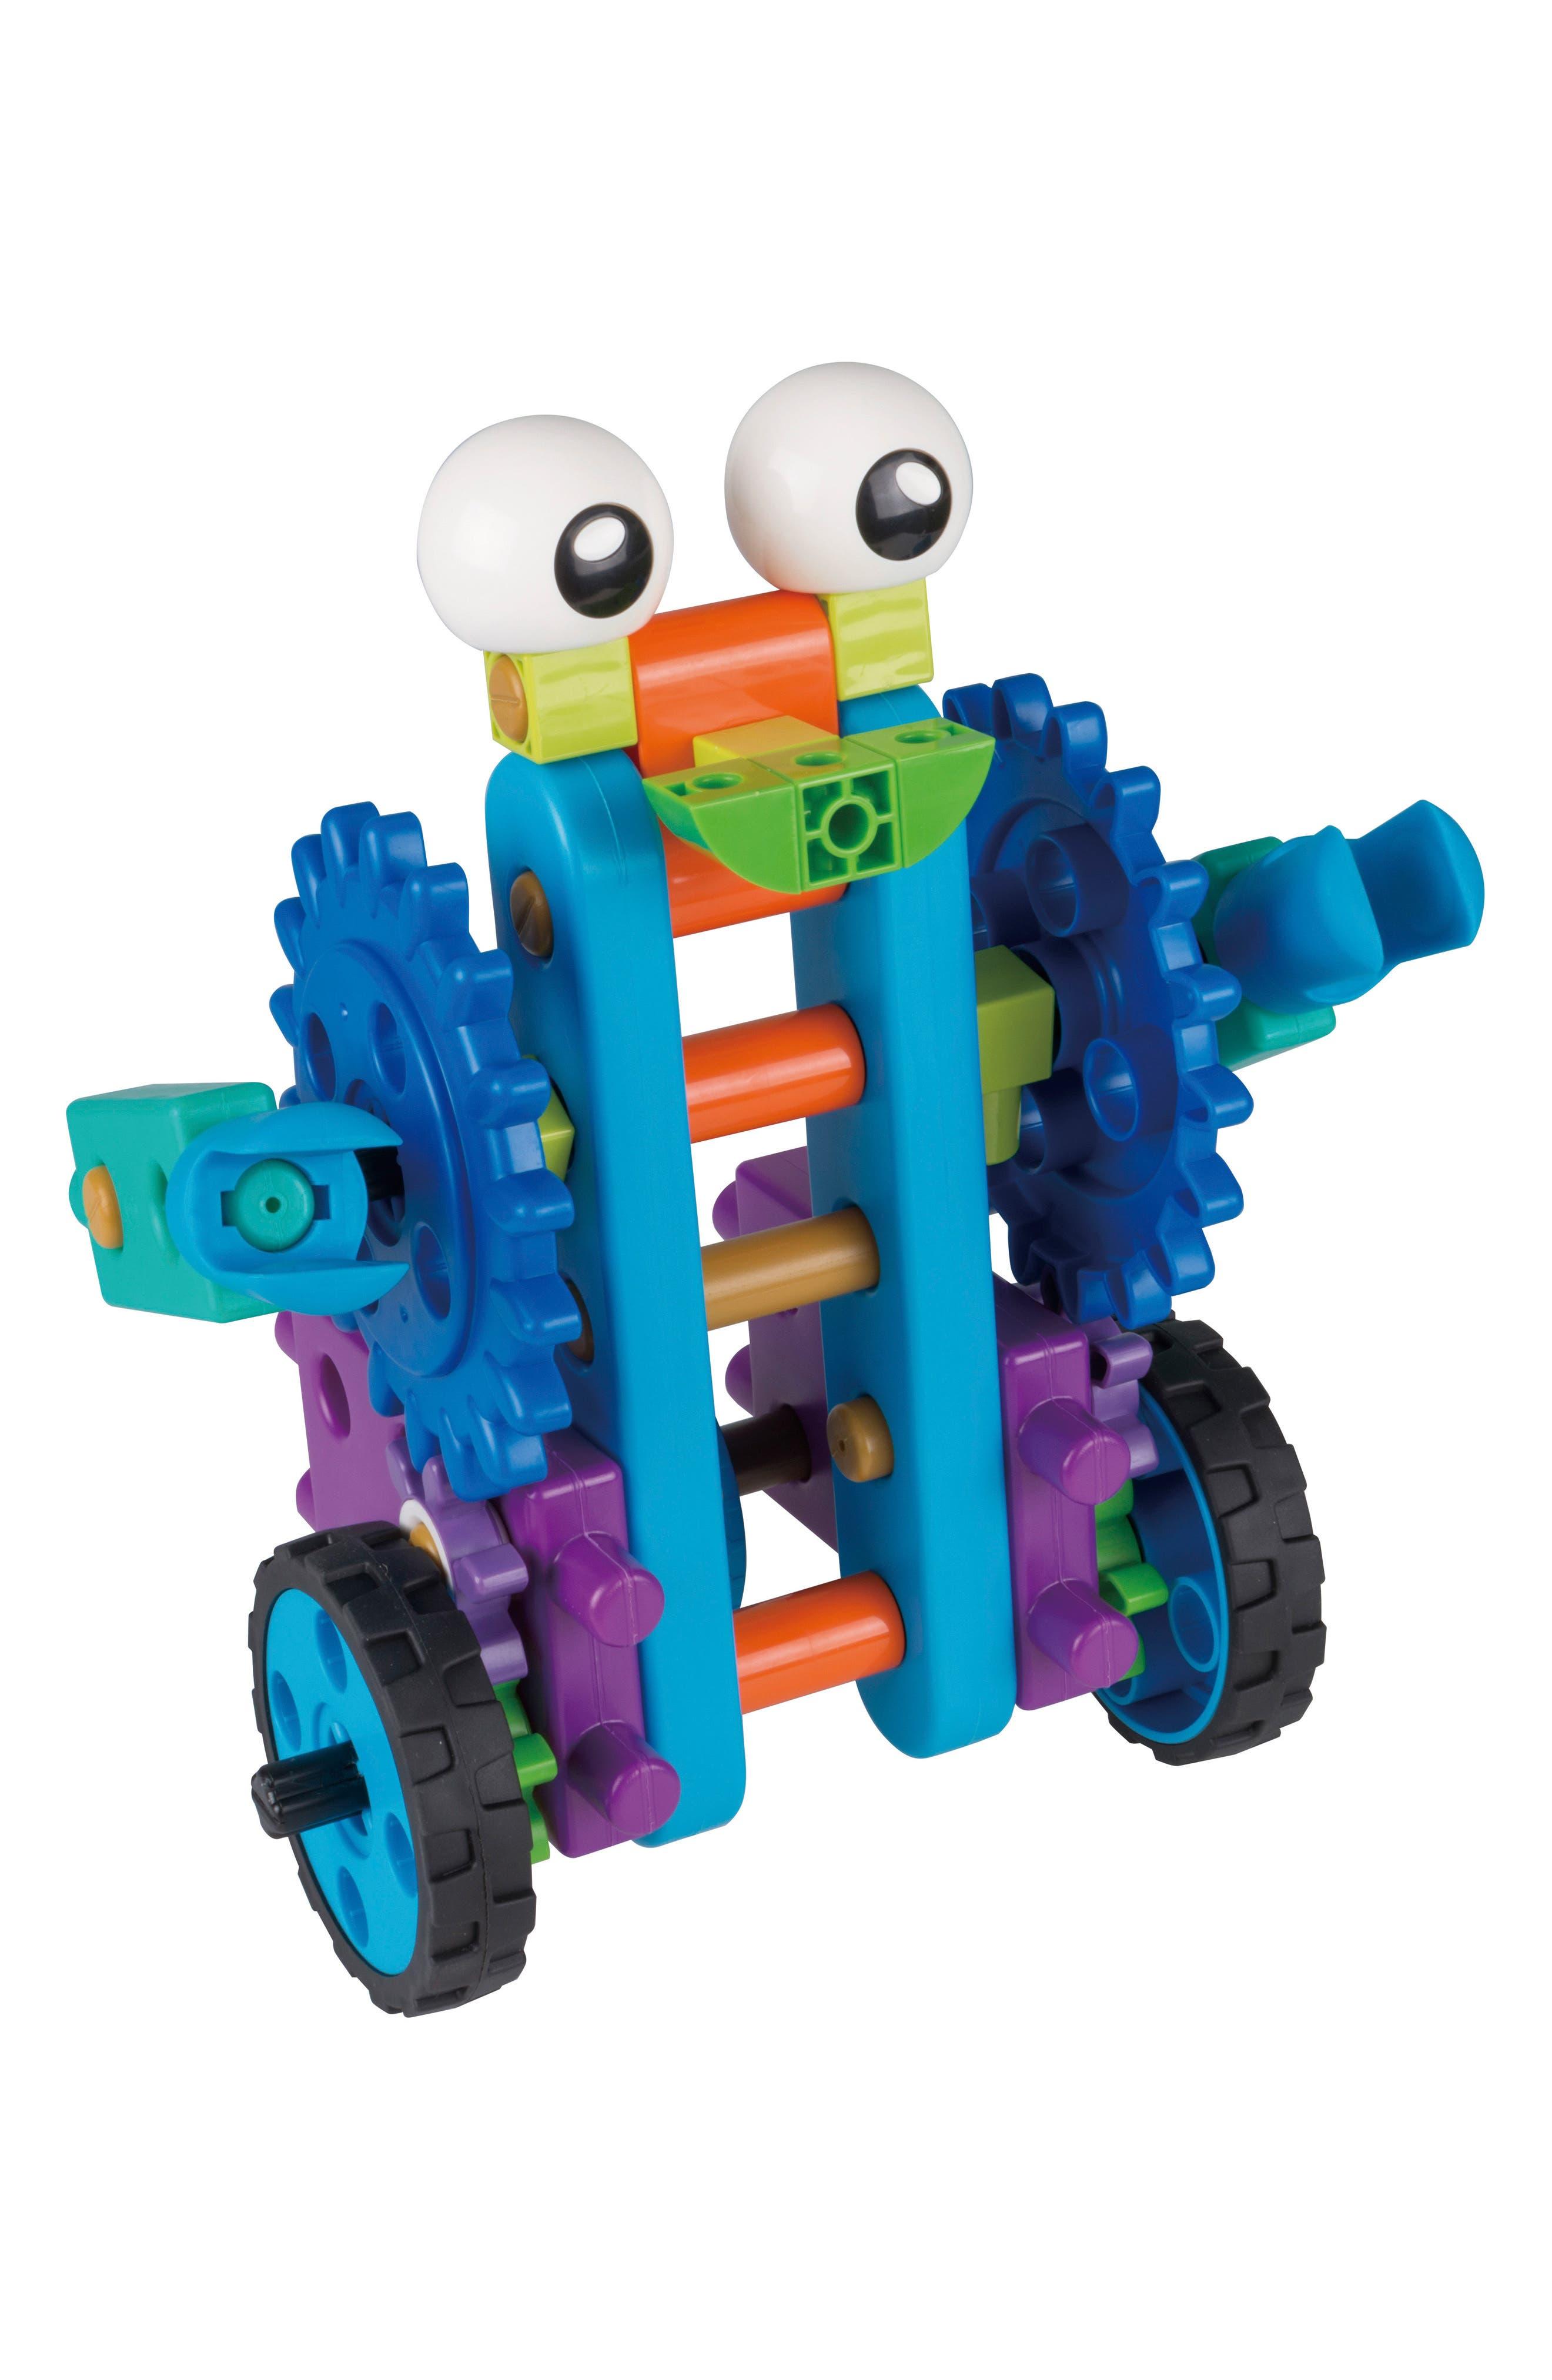 Robot Engineer Building Set & Storybook,                             Alternate thumbnail 8, color,                             401